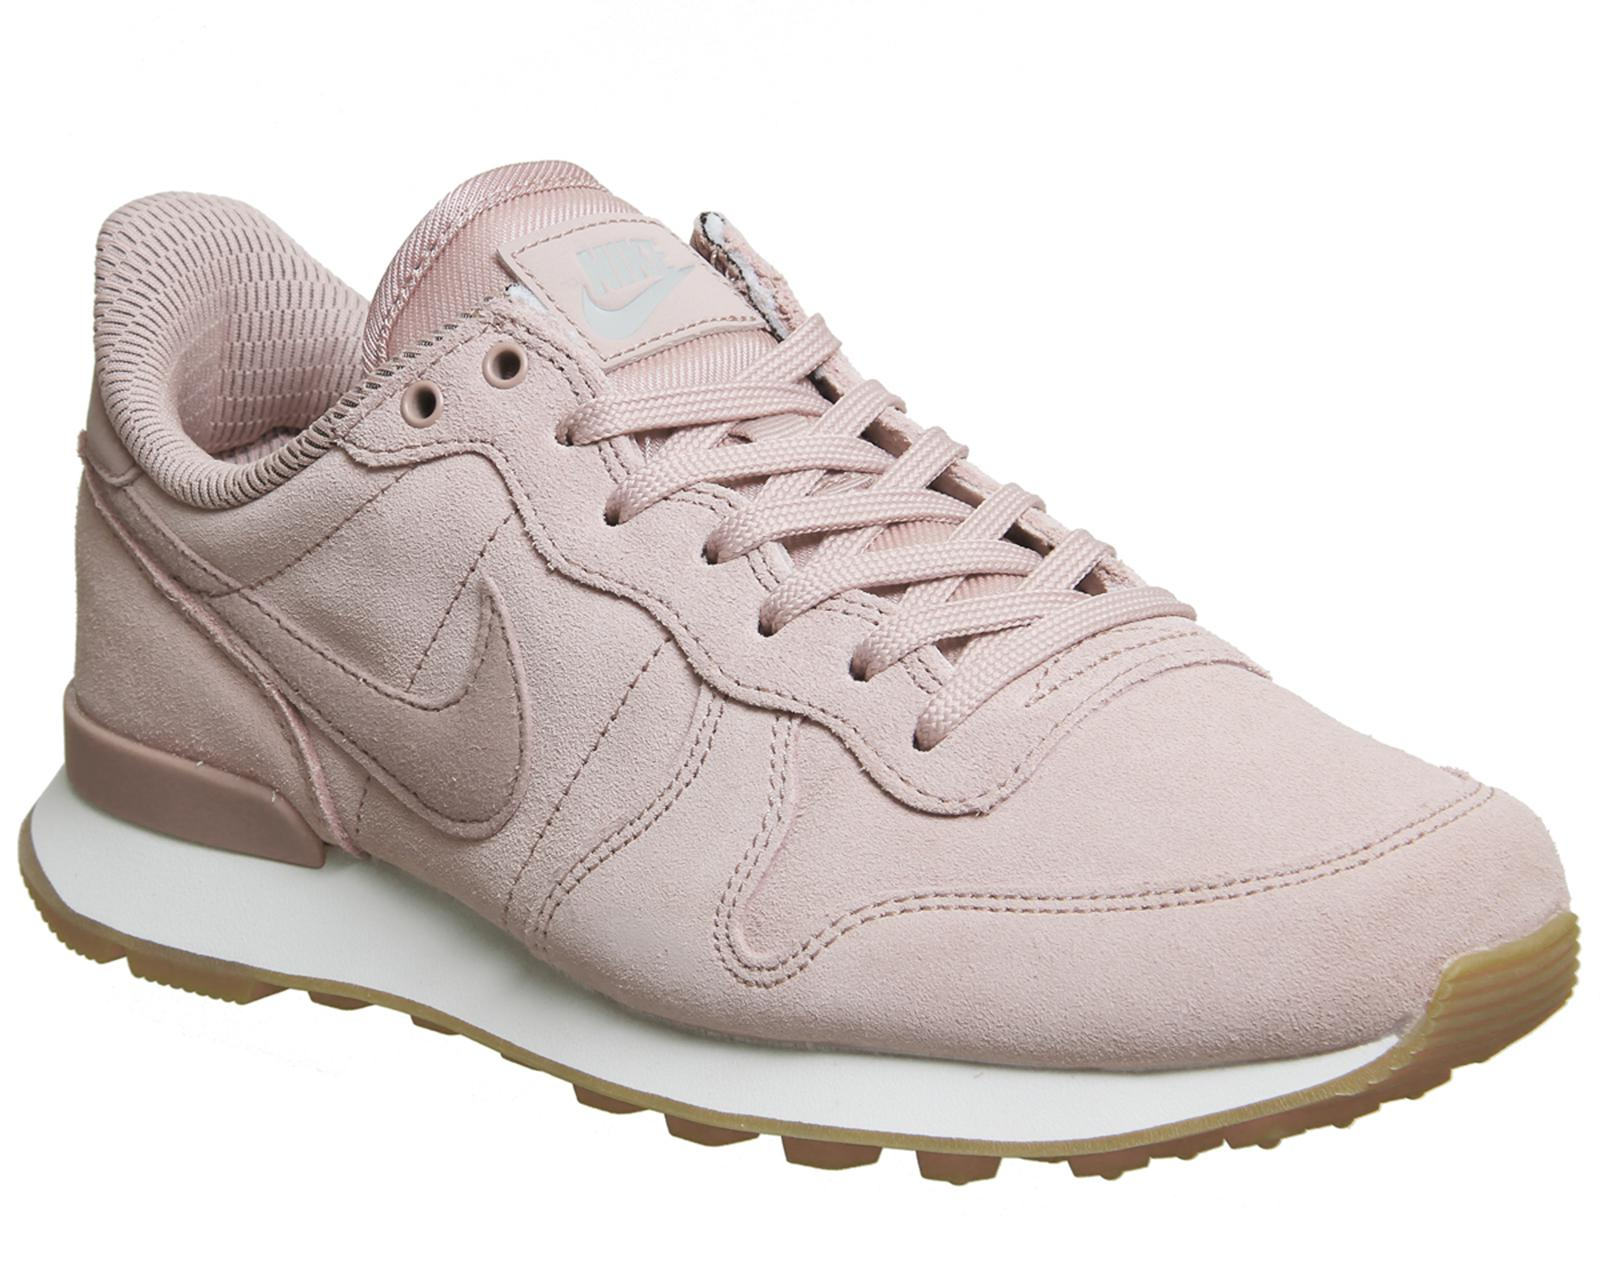 Nike. Women's Pink Internationalist Trainers